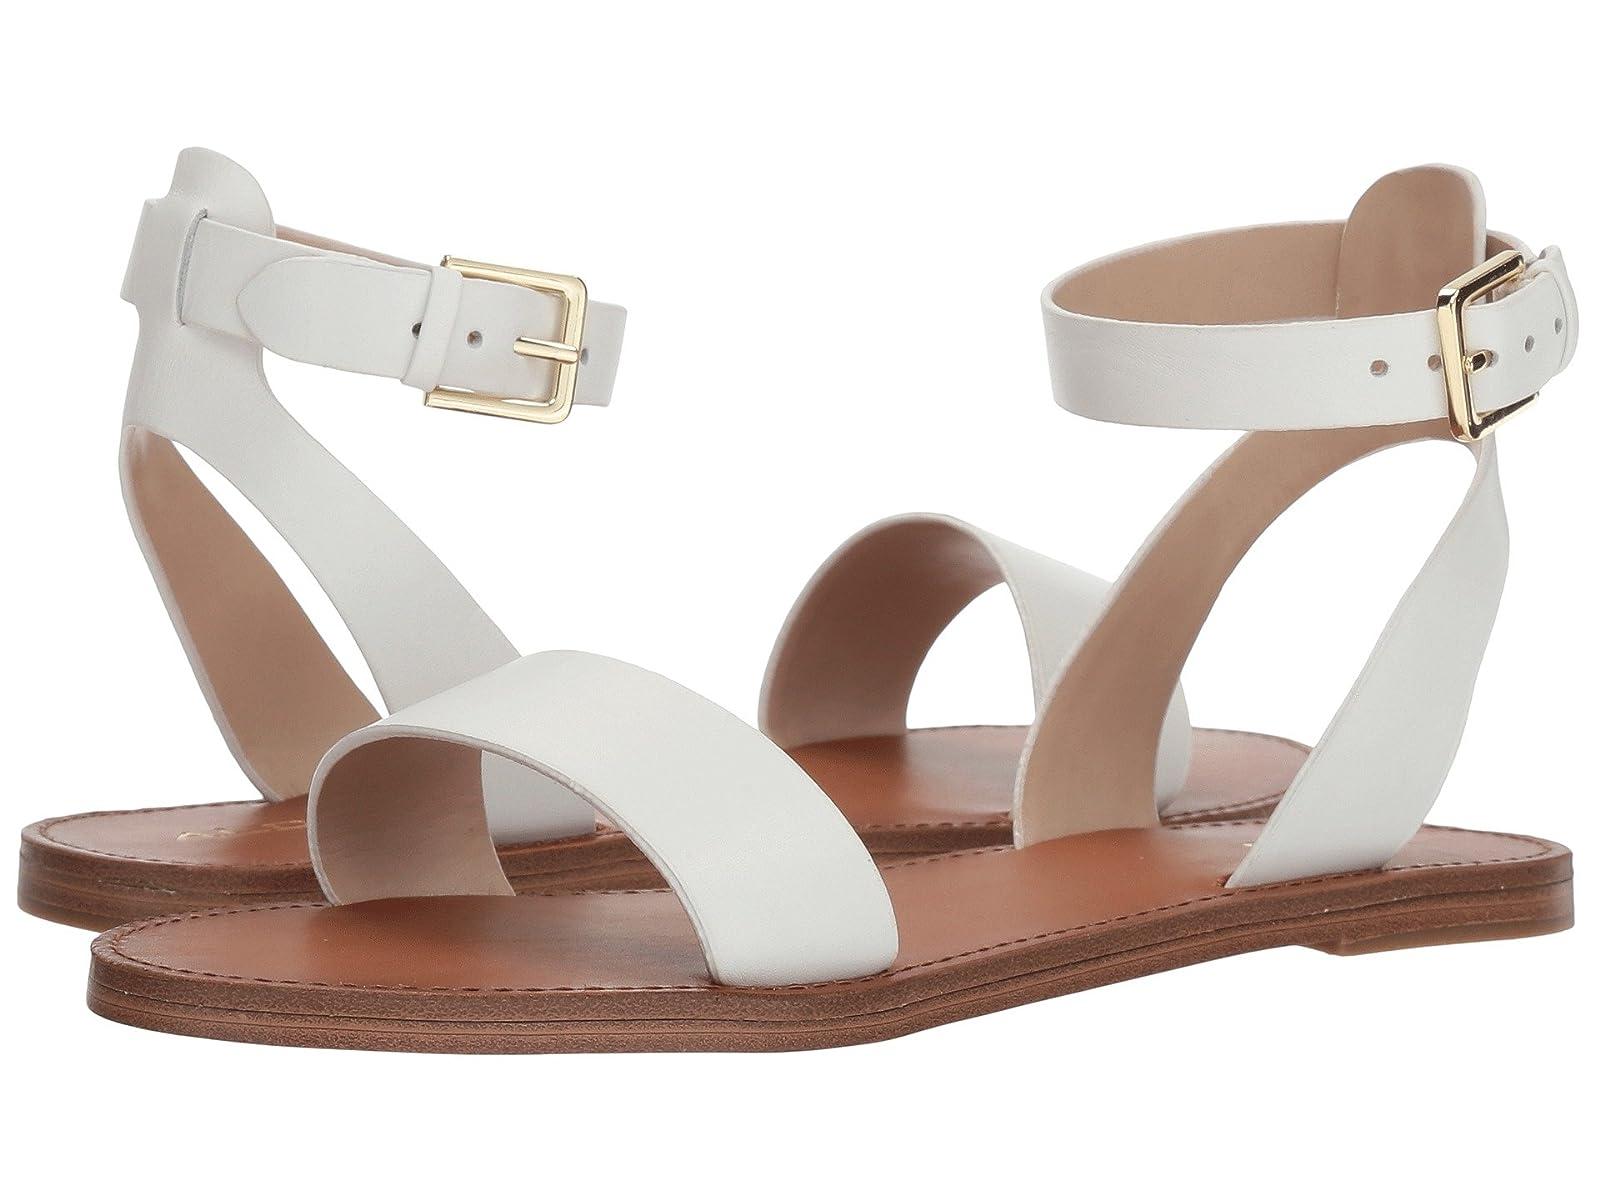 ALDO CampodoroAtmospheric grades have affordable shoes